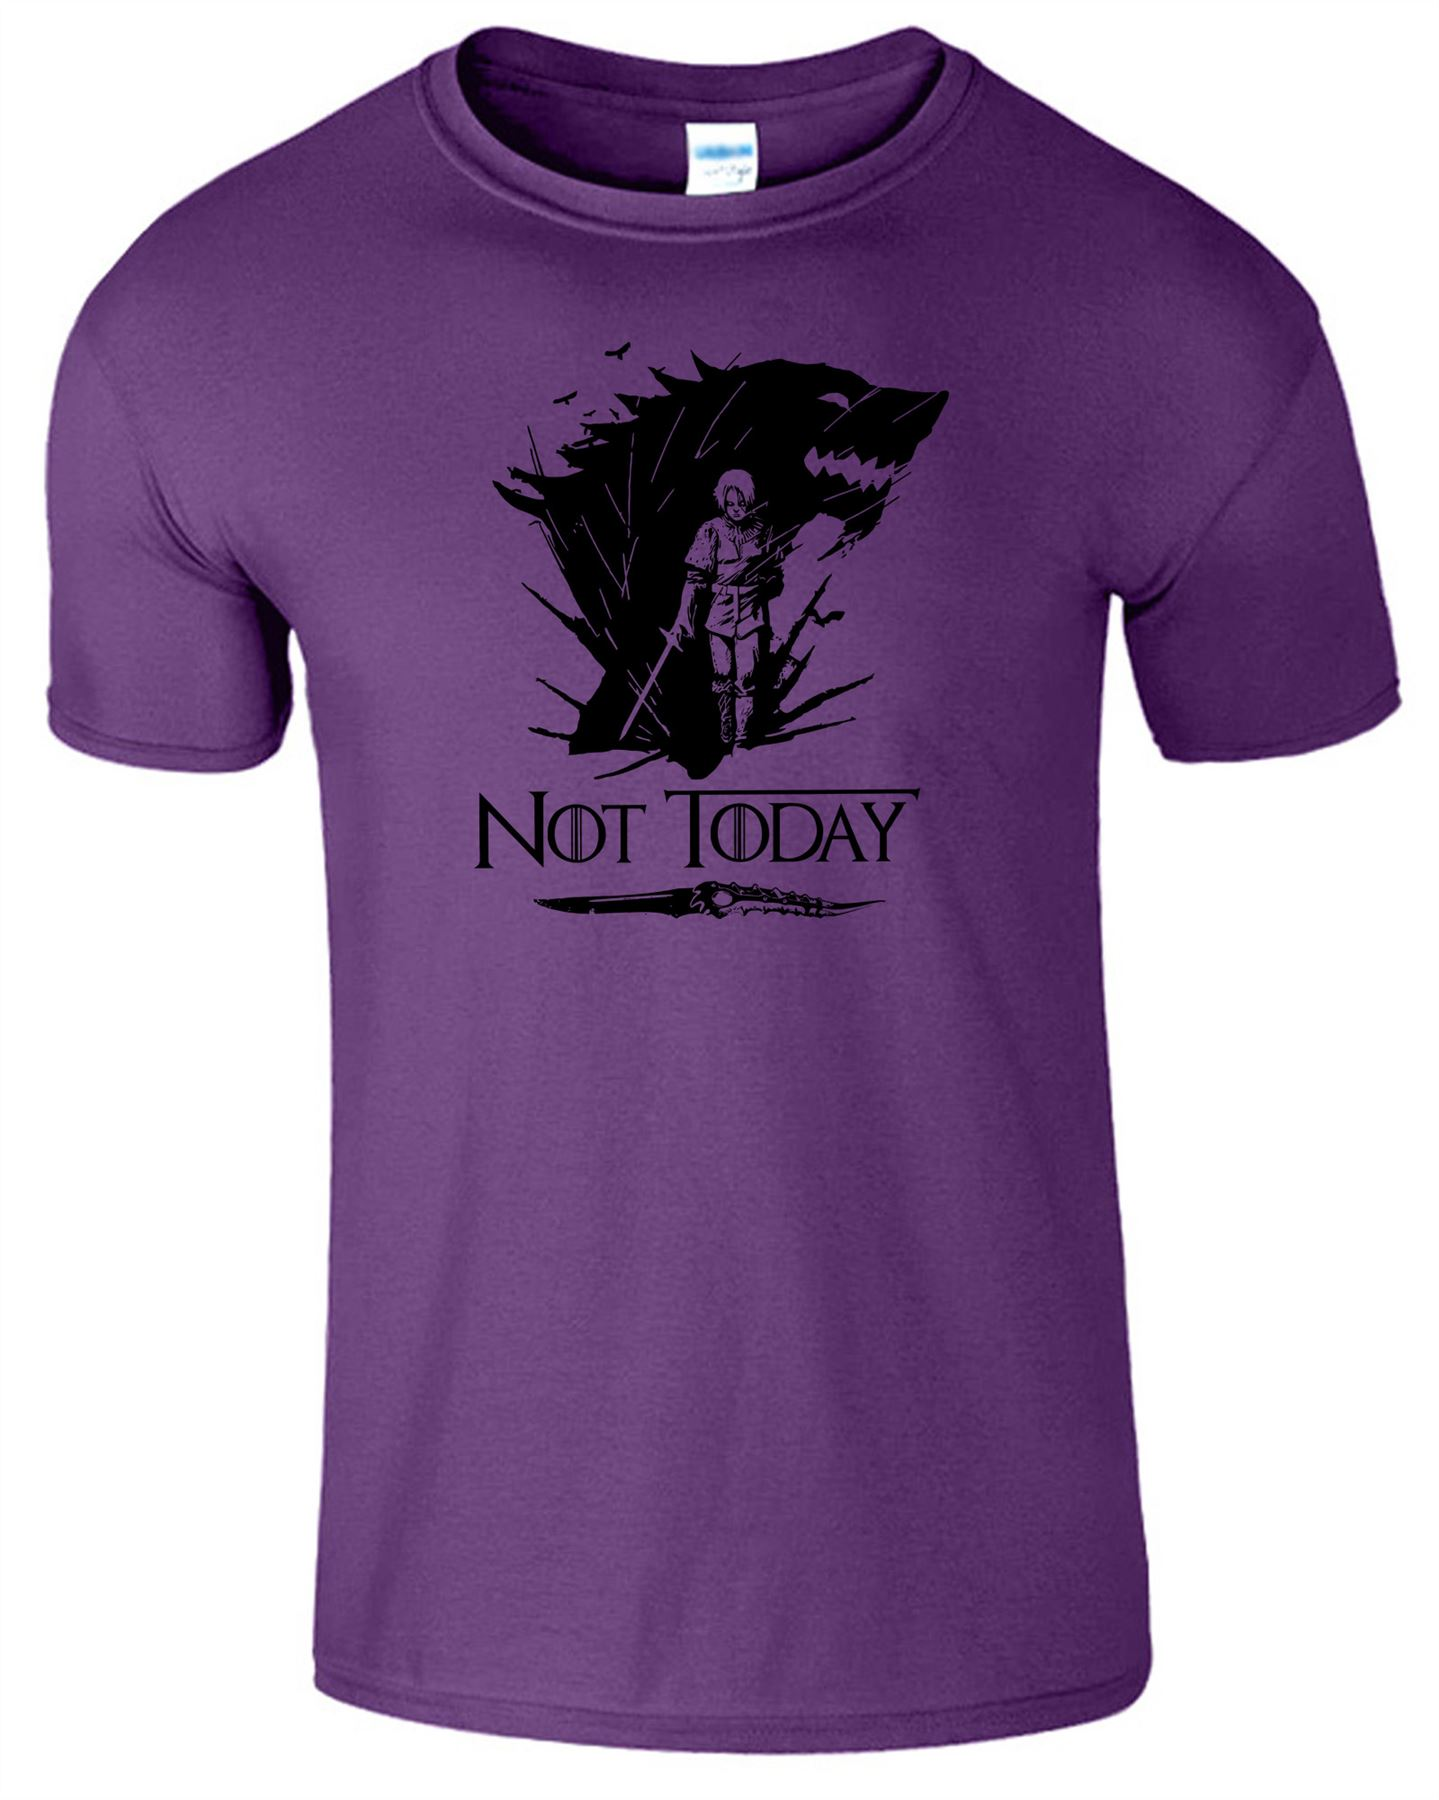 Arya-Stark-Not-Today-T-Shirt-Mens-Game-Season-Womens-Shirt-Adults-Unisex-Fit Indexbild 36